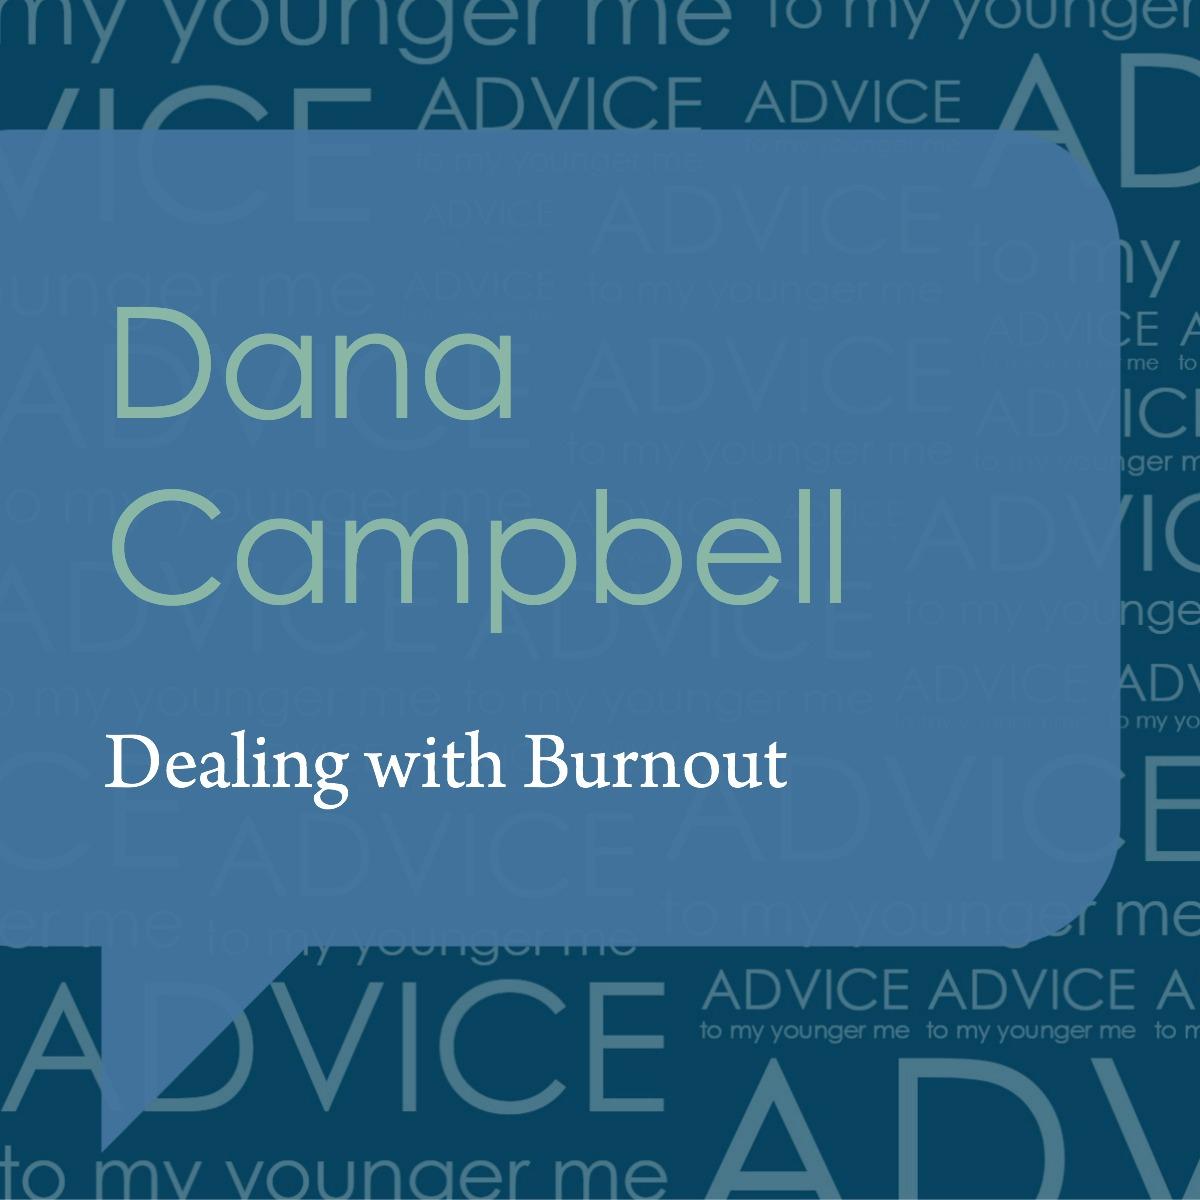 Dana Campbell